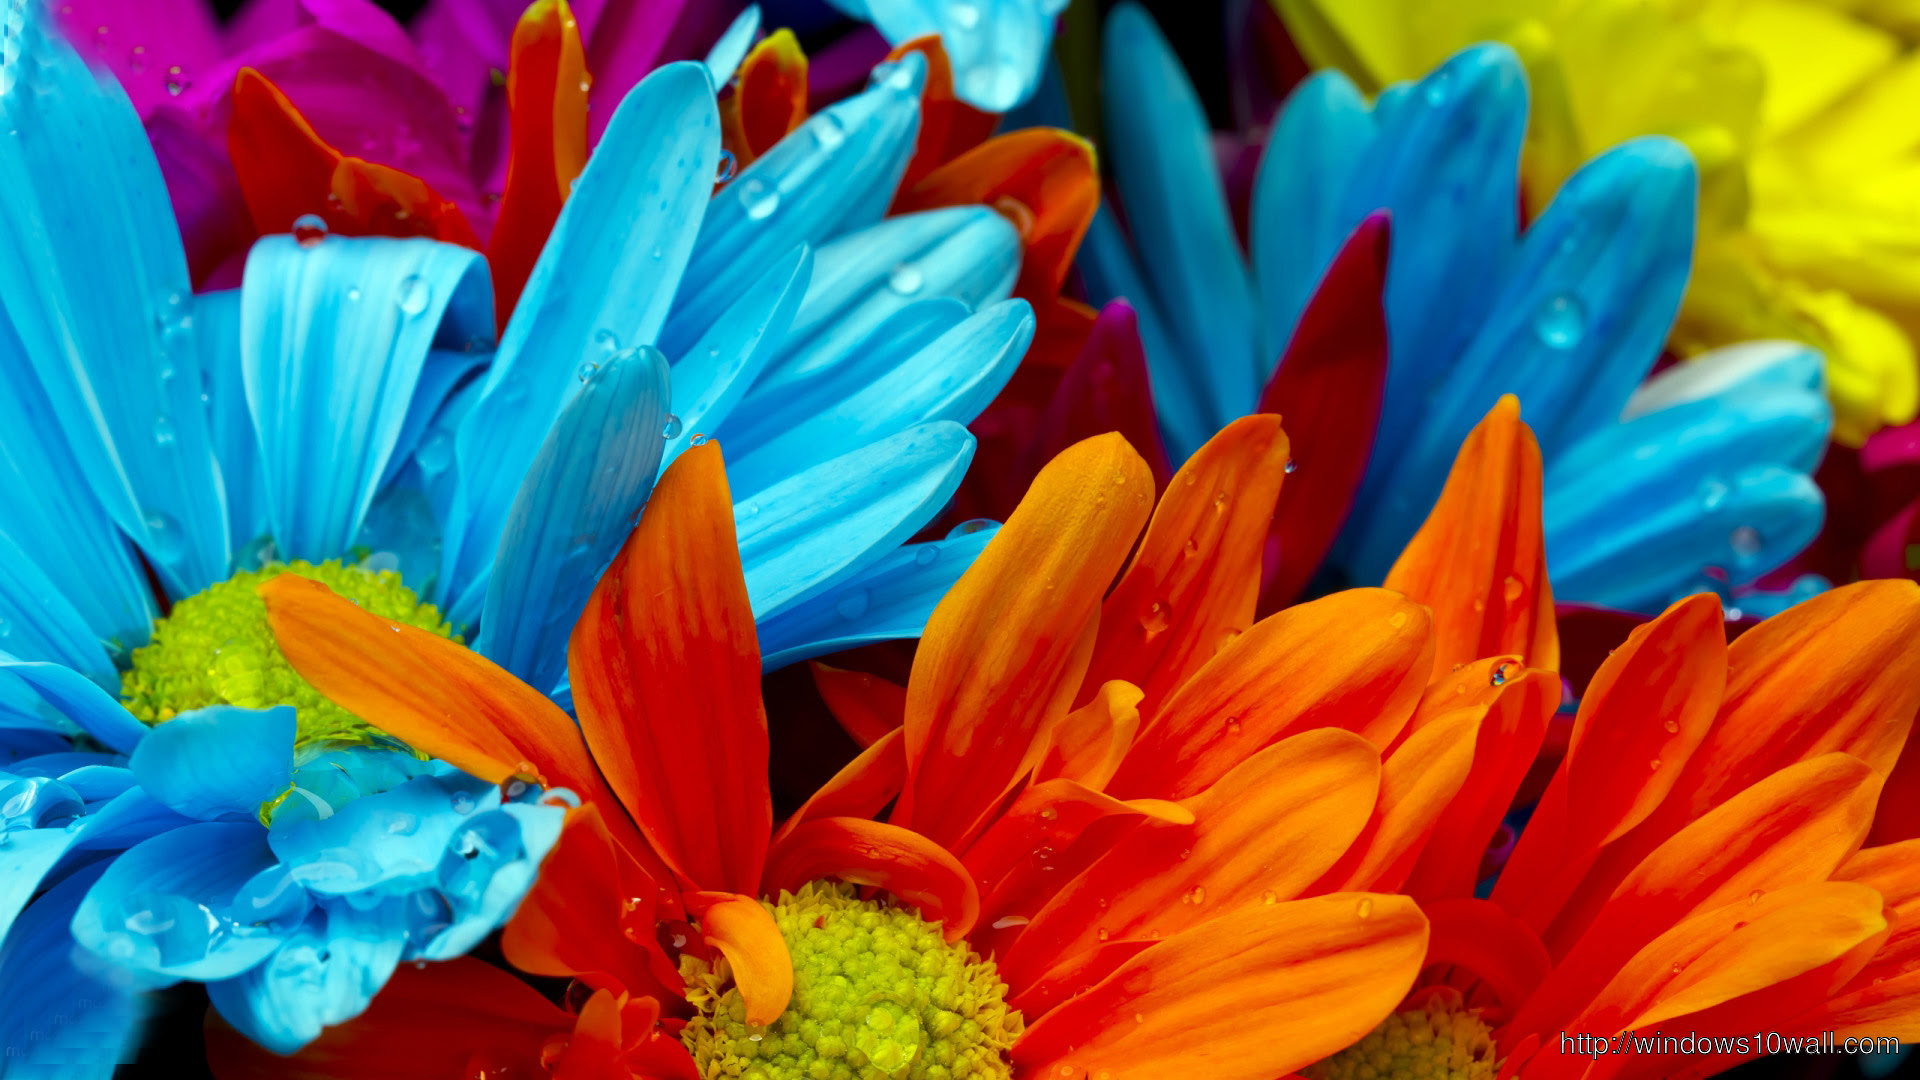 Colorful Flowers Effy Moom